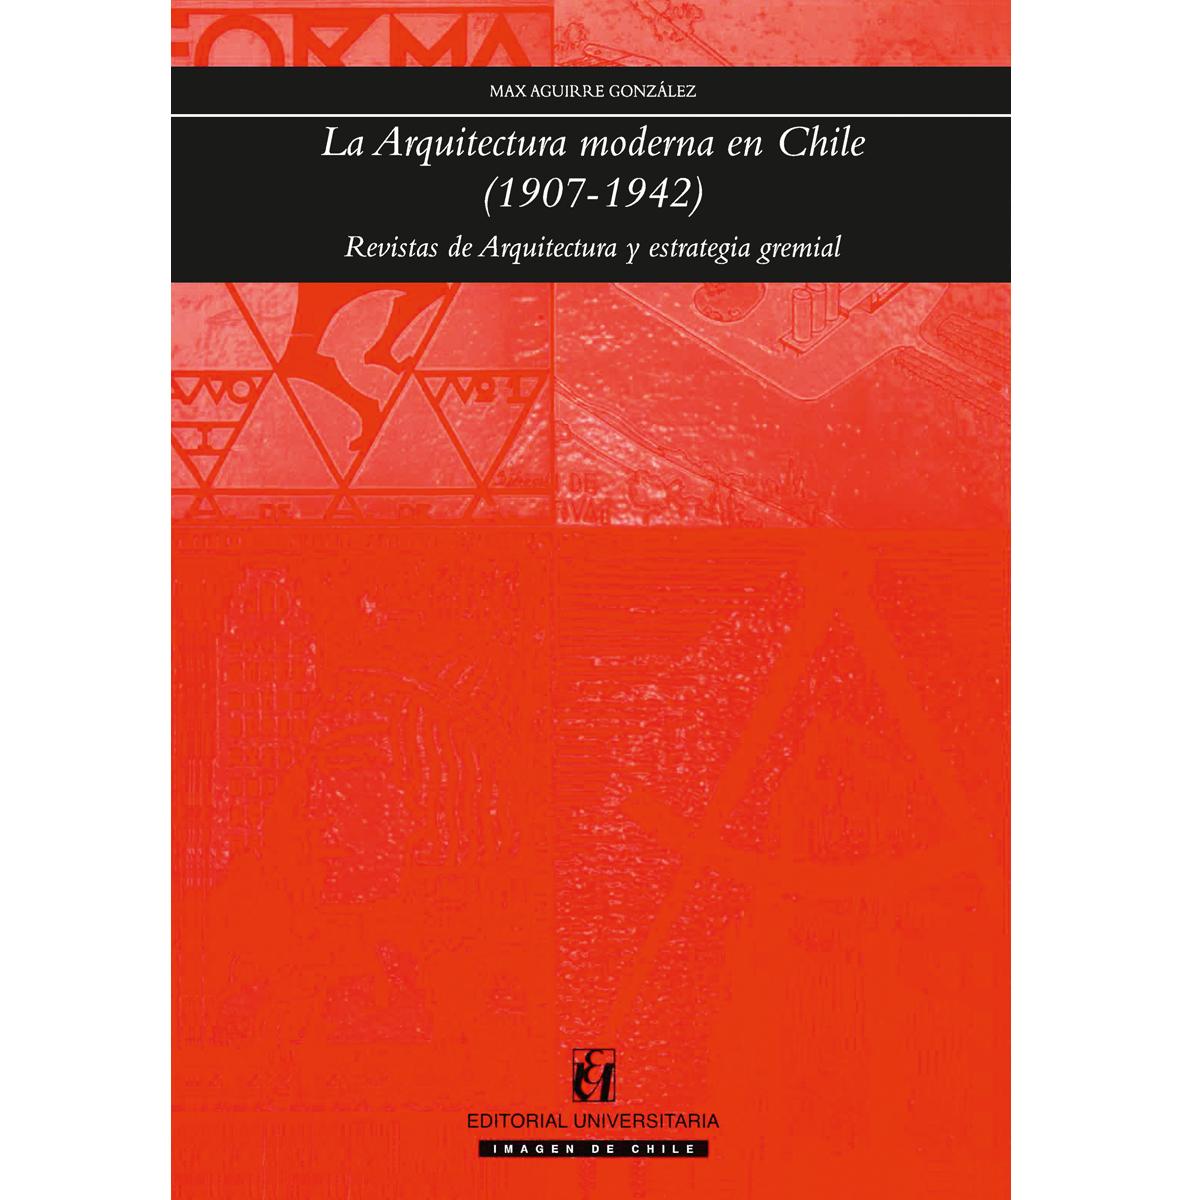 La arquitectura moderna en Chile (1907-1942)